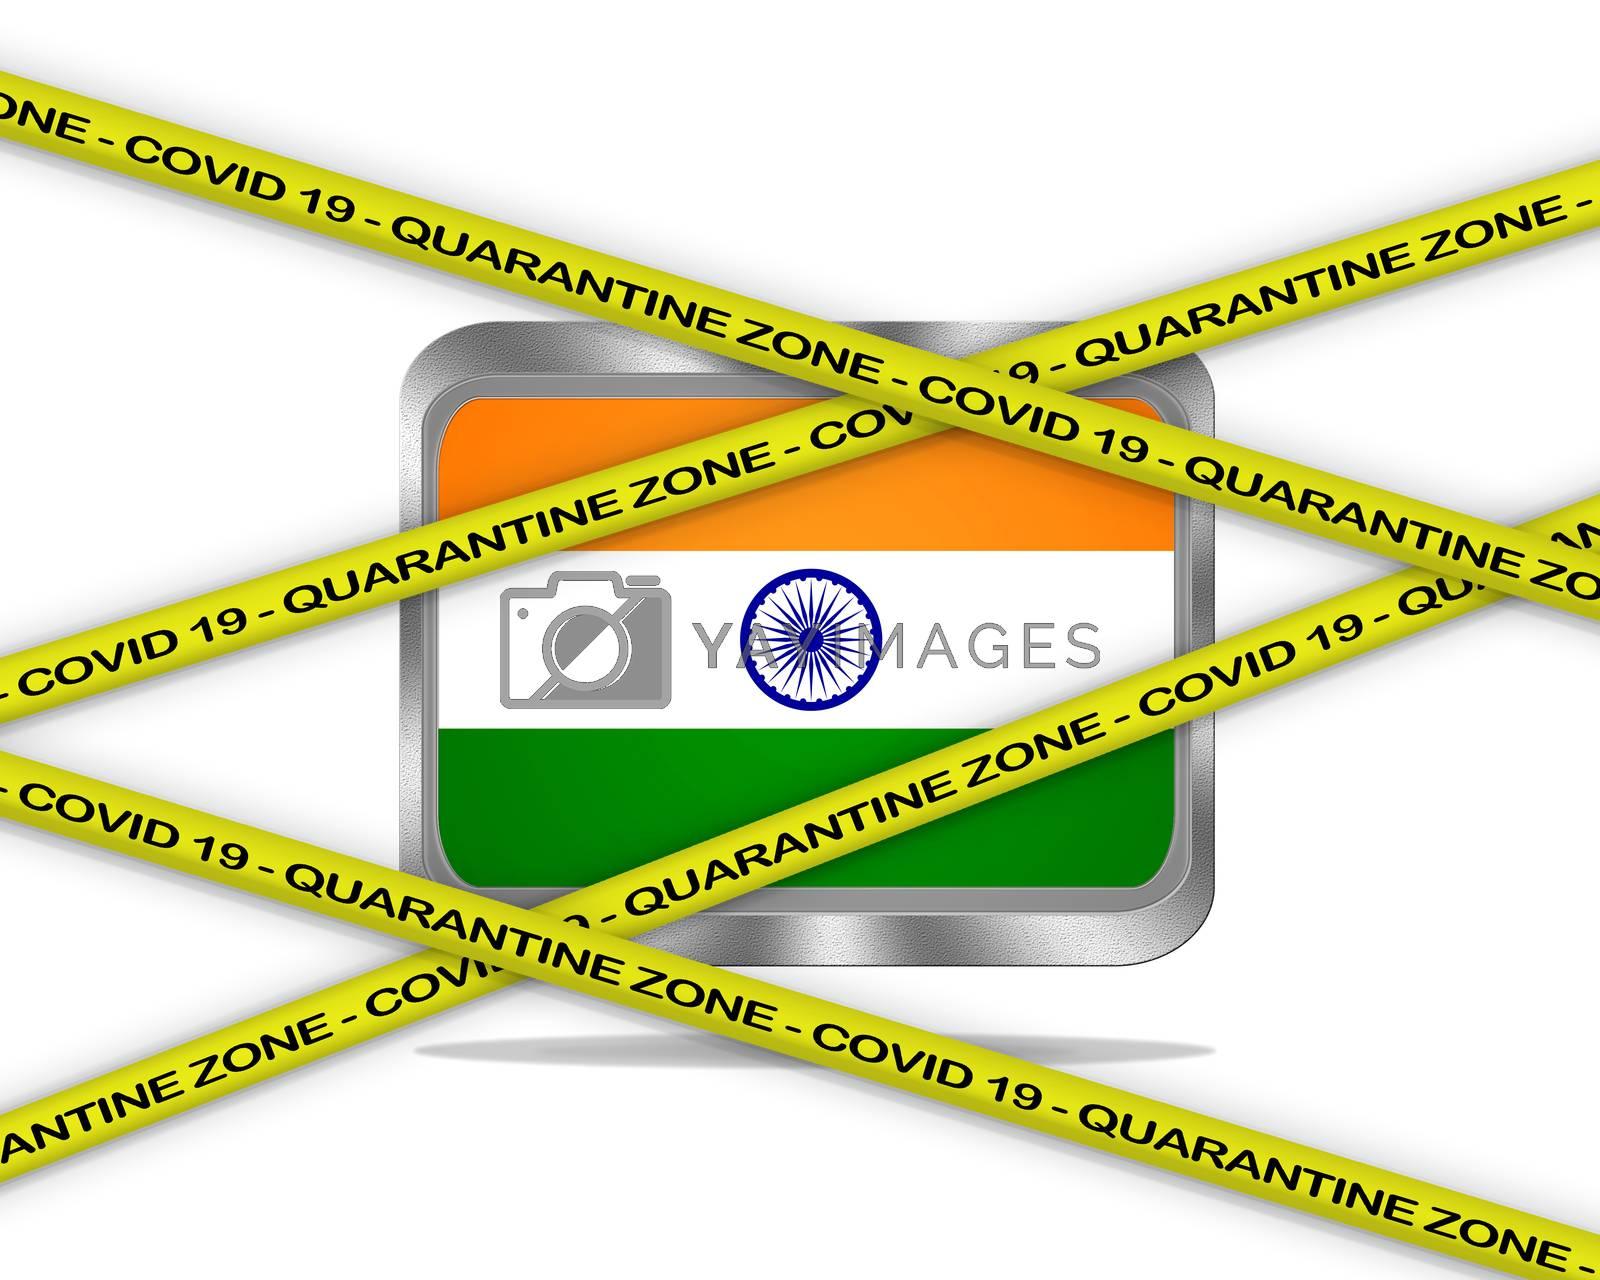 COVID-19 warning yellow ribbon written with: Quarantine zone Cover 19 on India flag illustration. Coronavirus danger area, quarantined country.